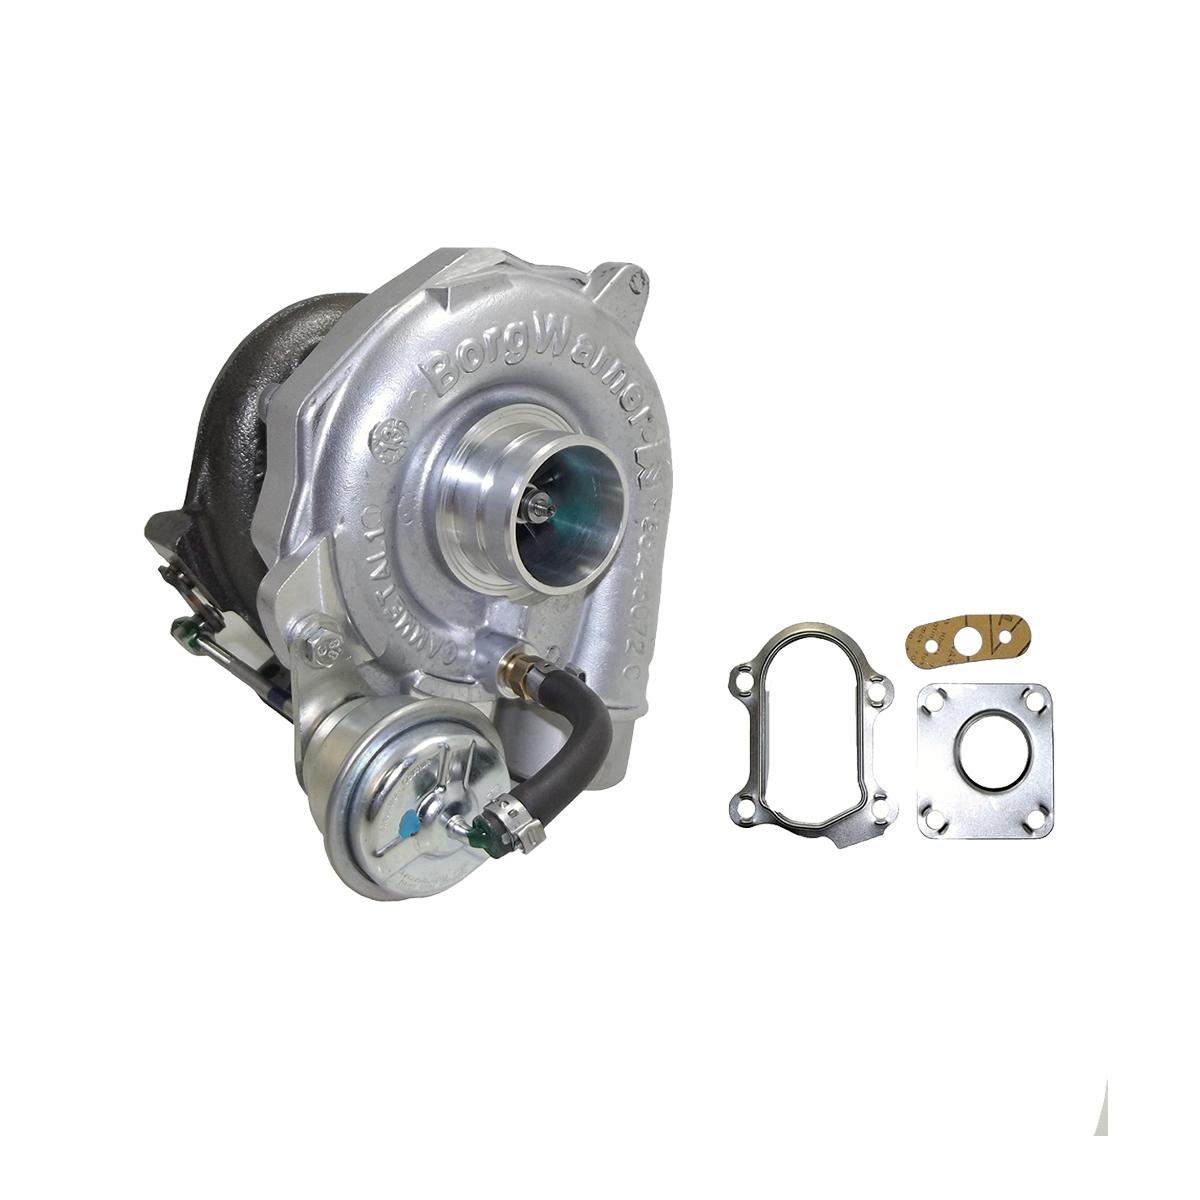 Turbina Do Motor Sem Intercooler - DAILY